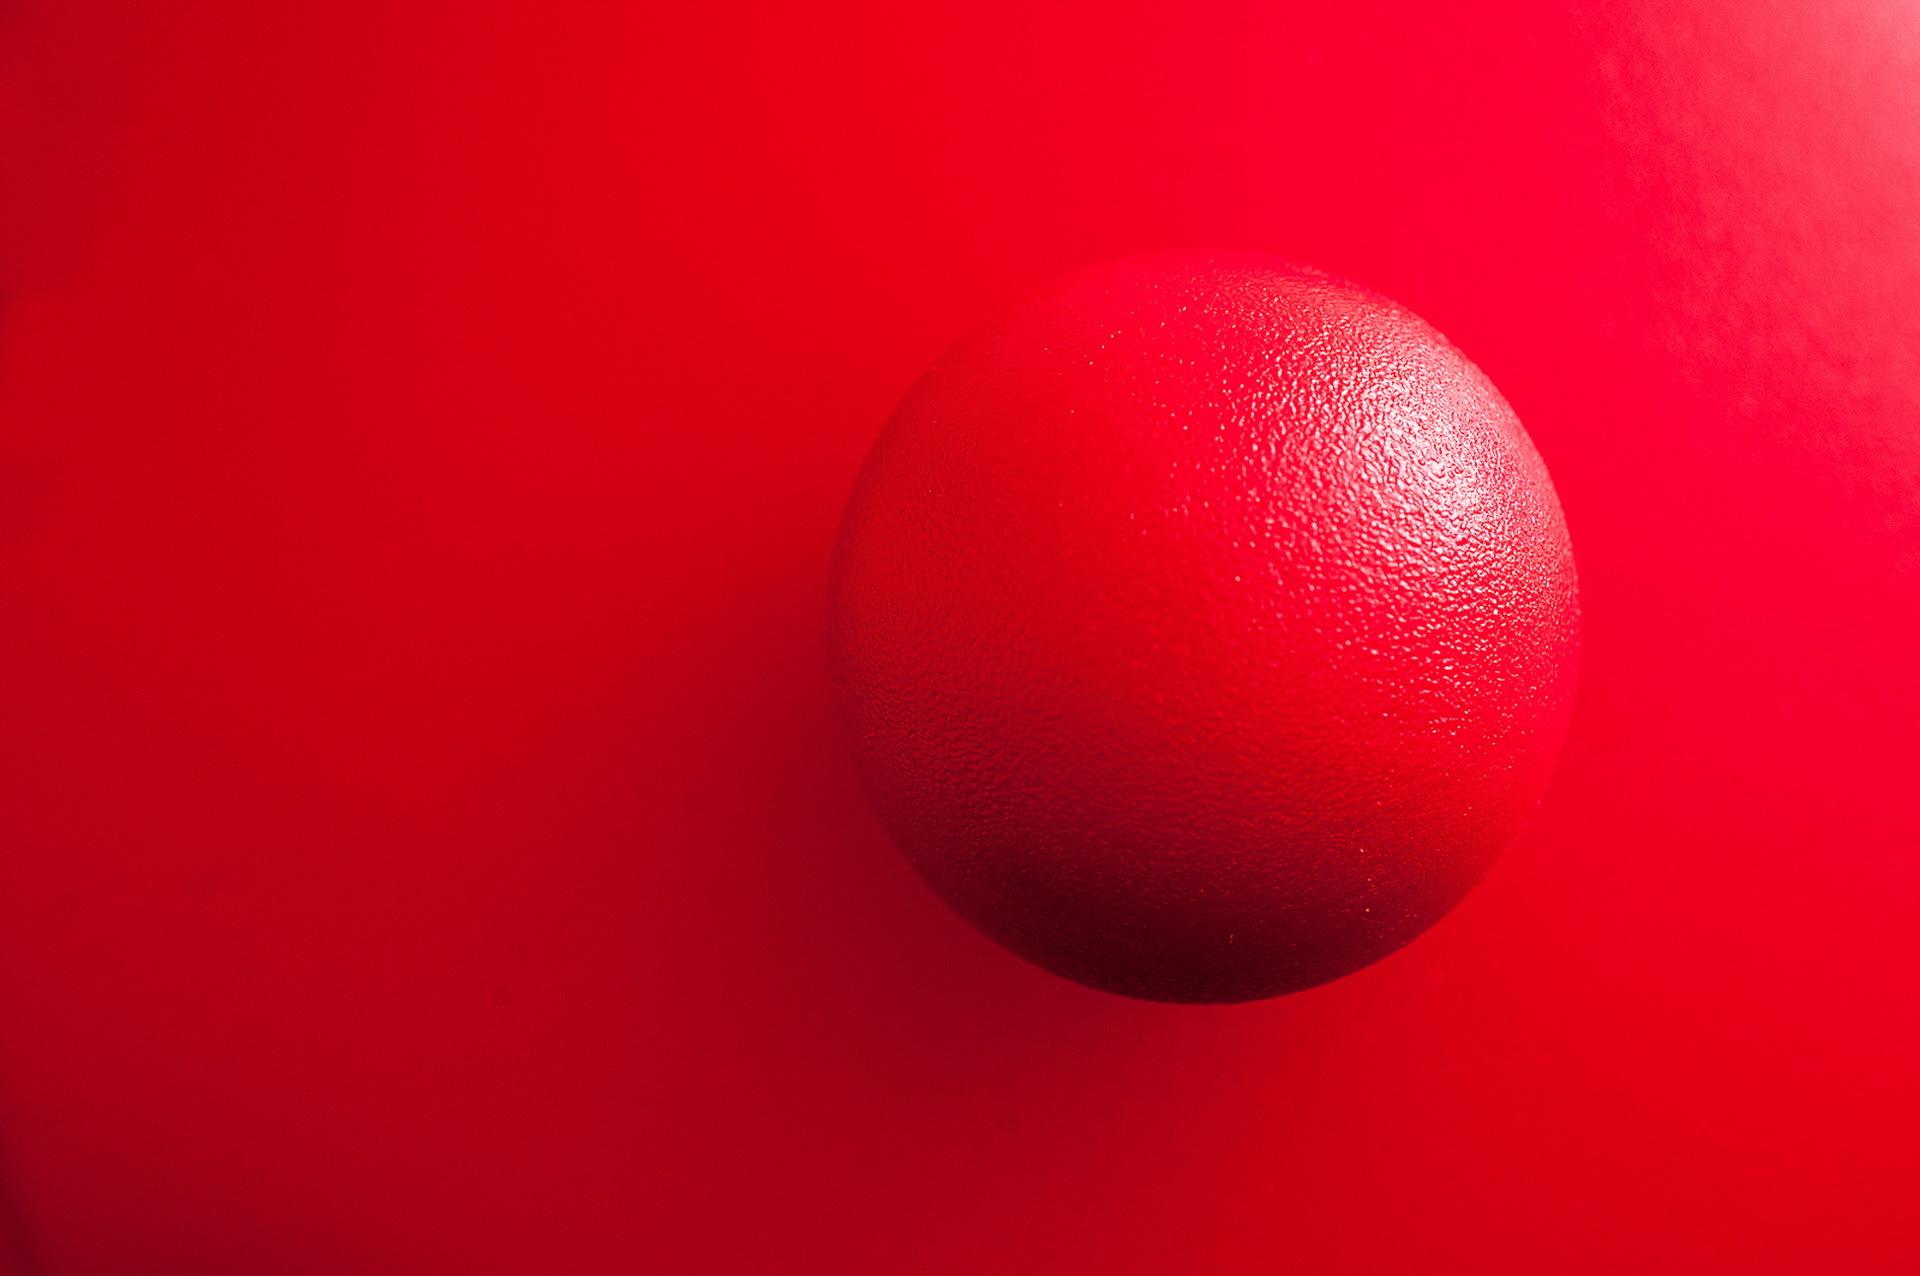 ярко красный шар картинка башмет стал